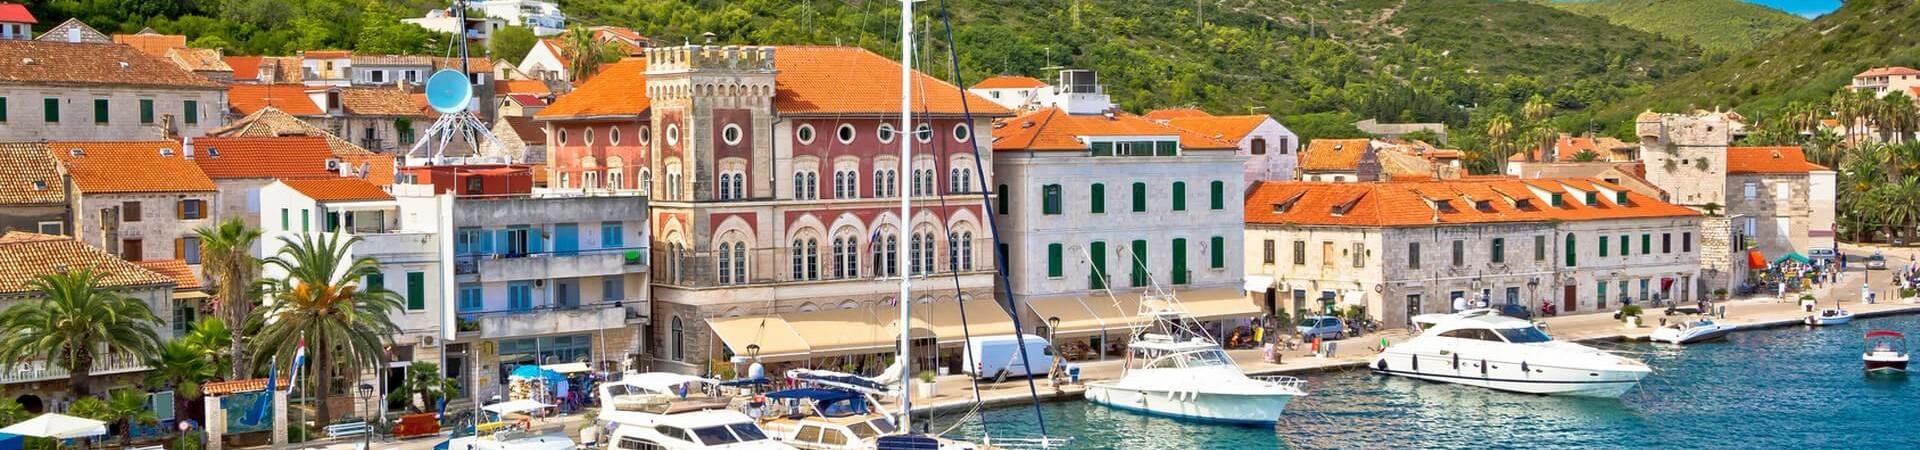 Chorwackie miasto Vis